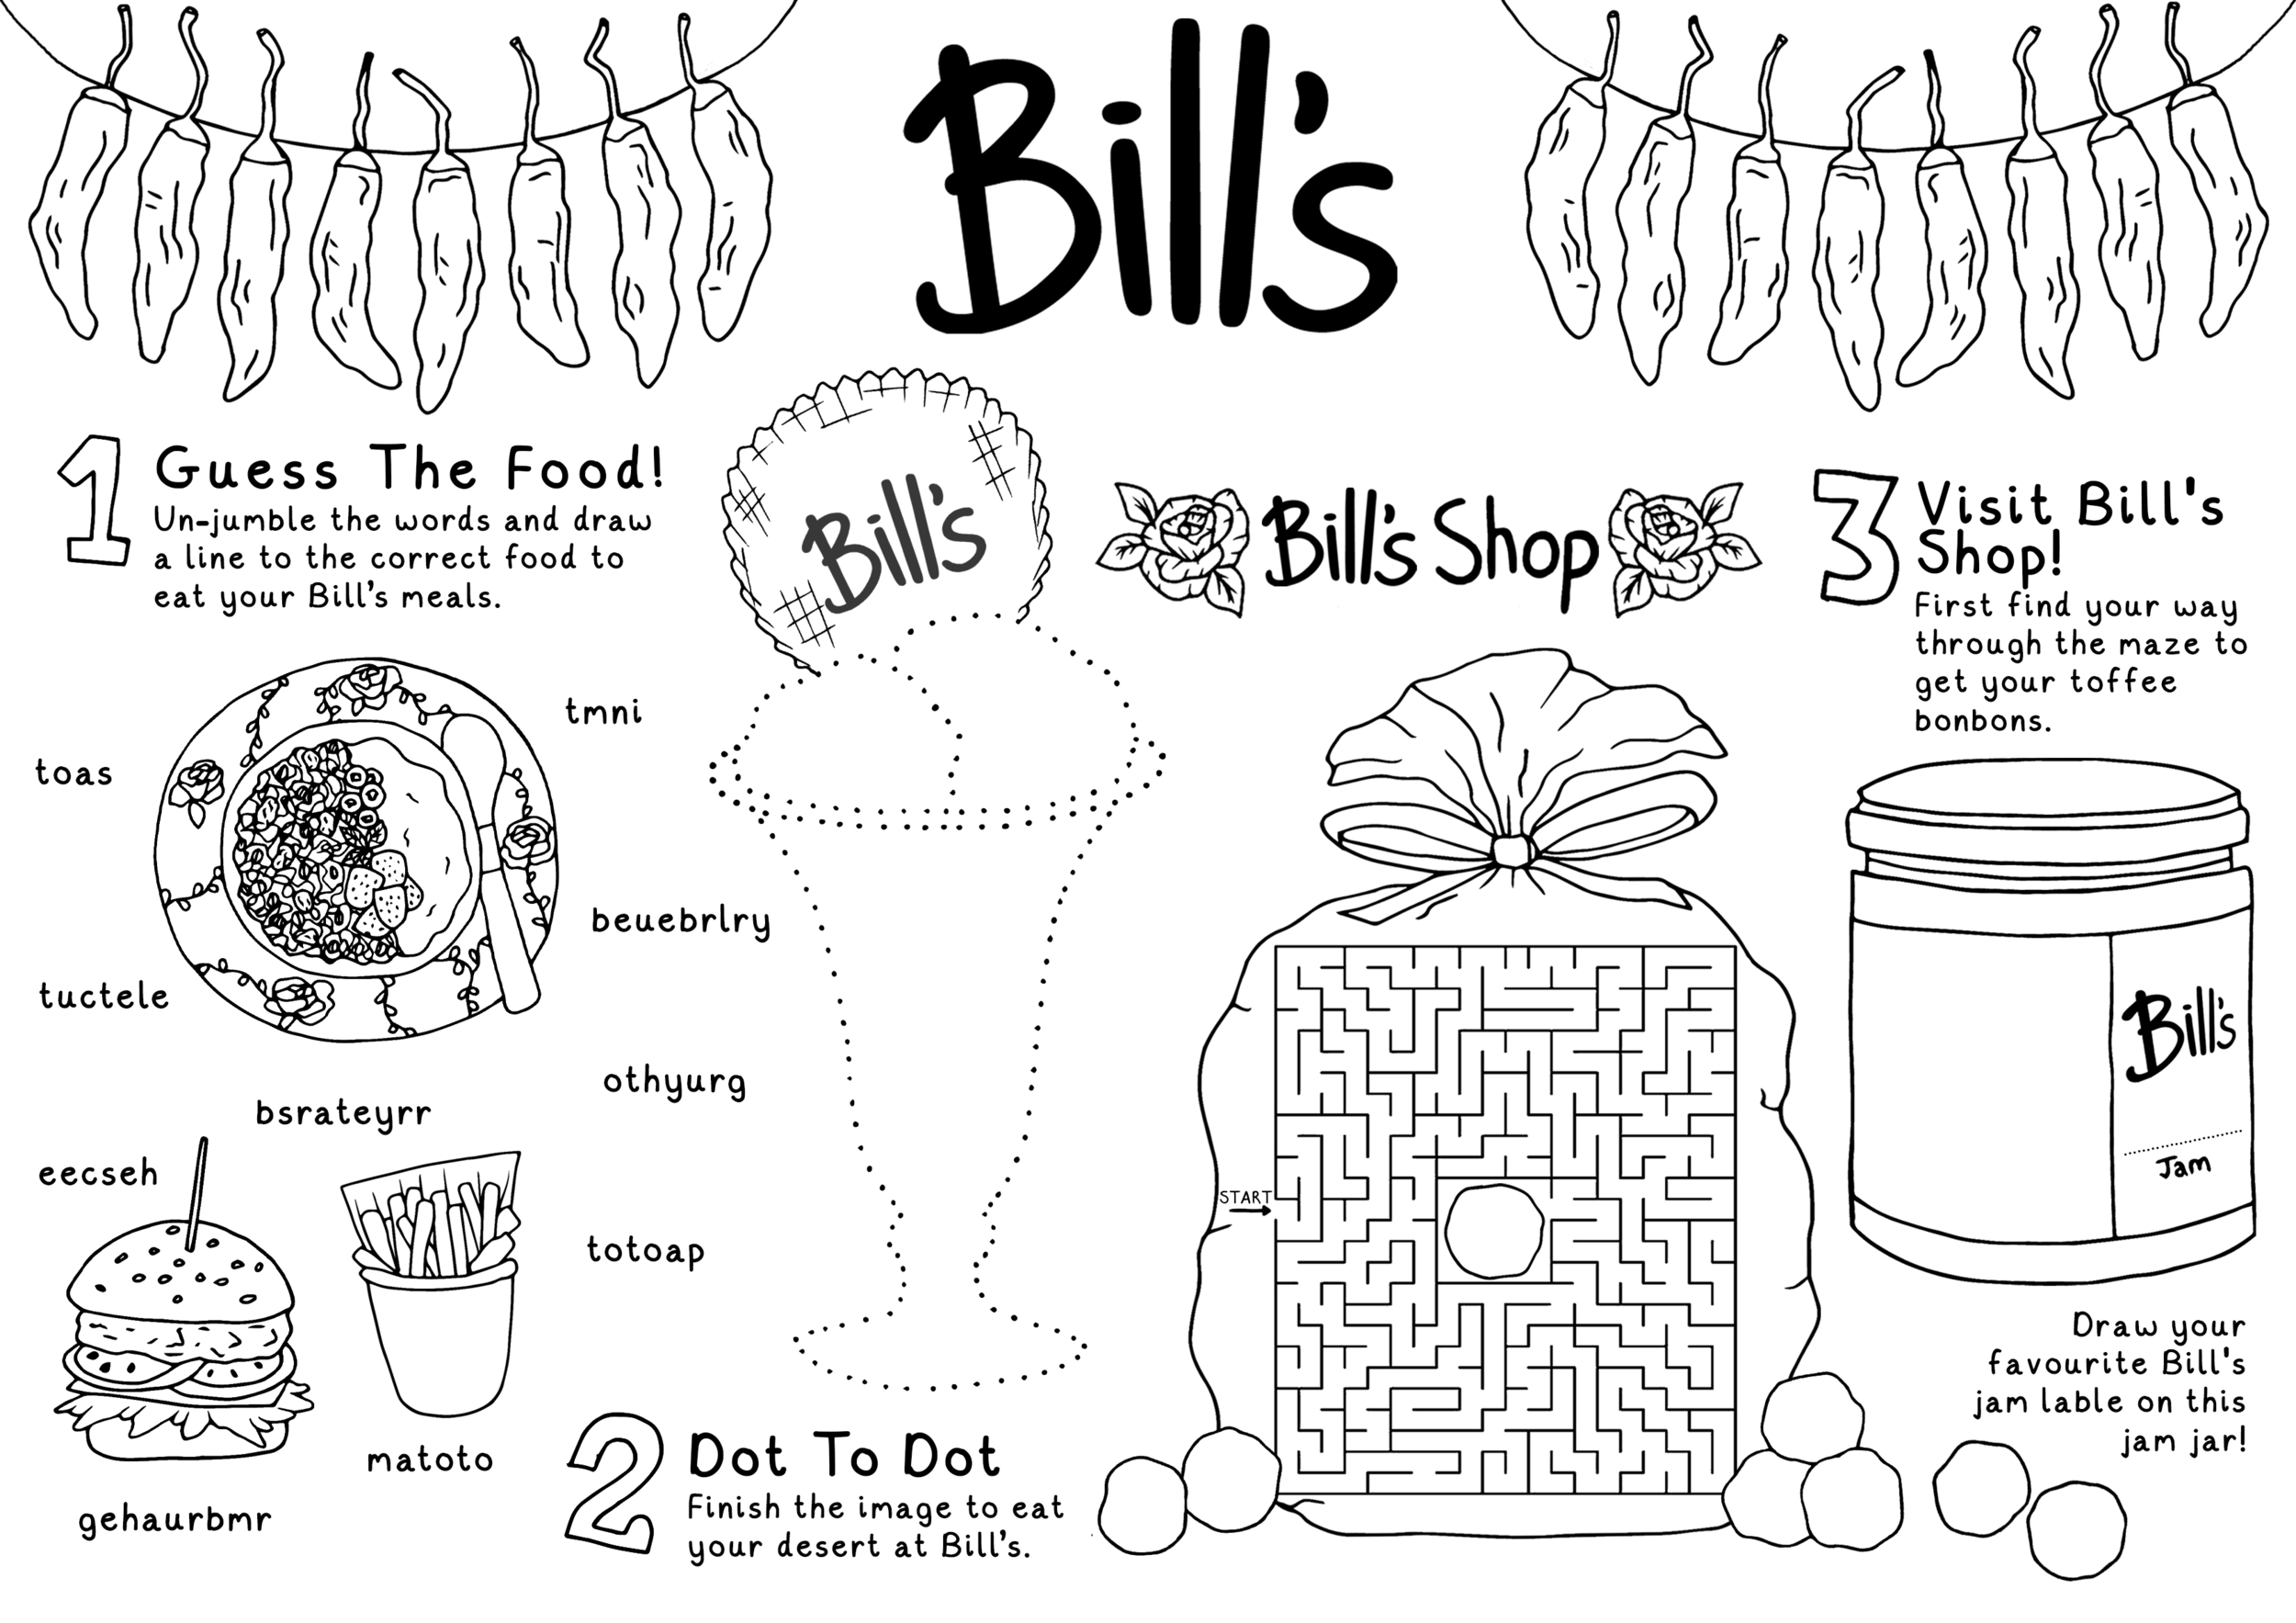 bills bw.png